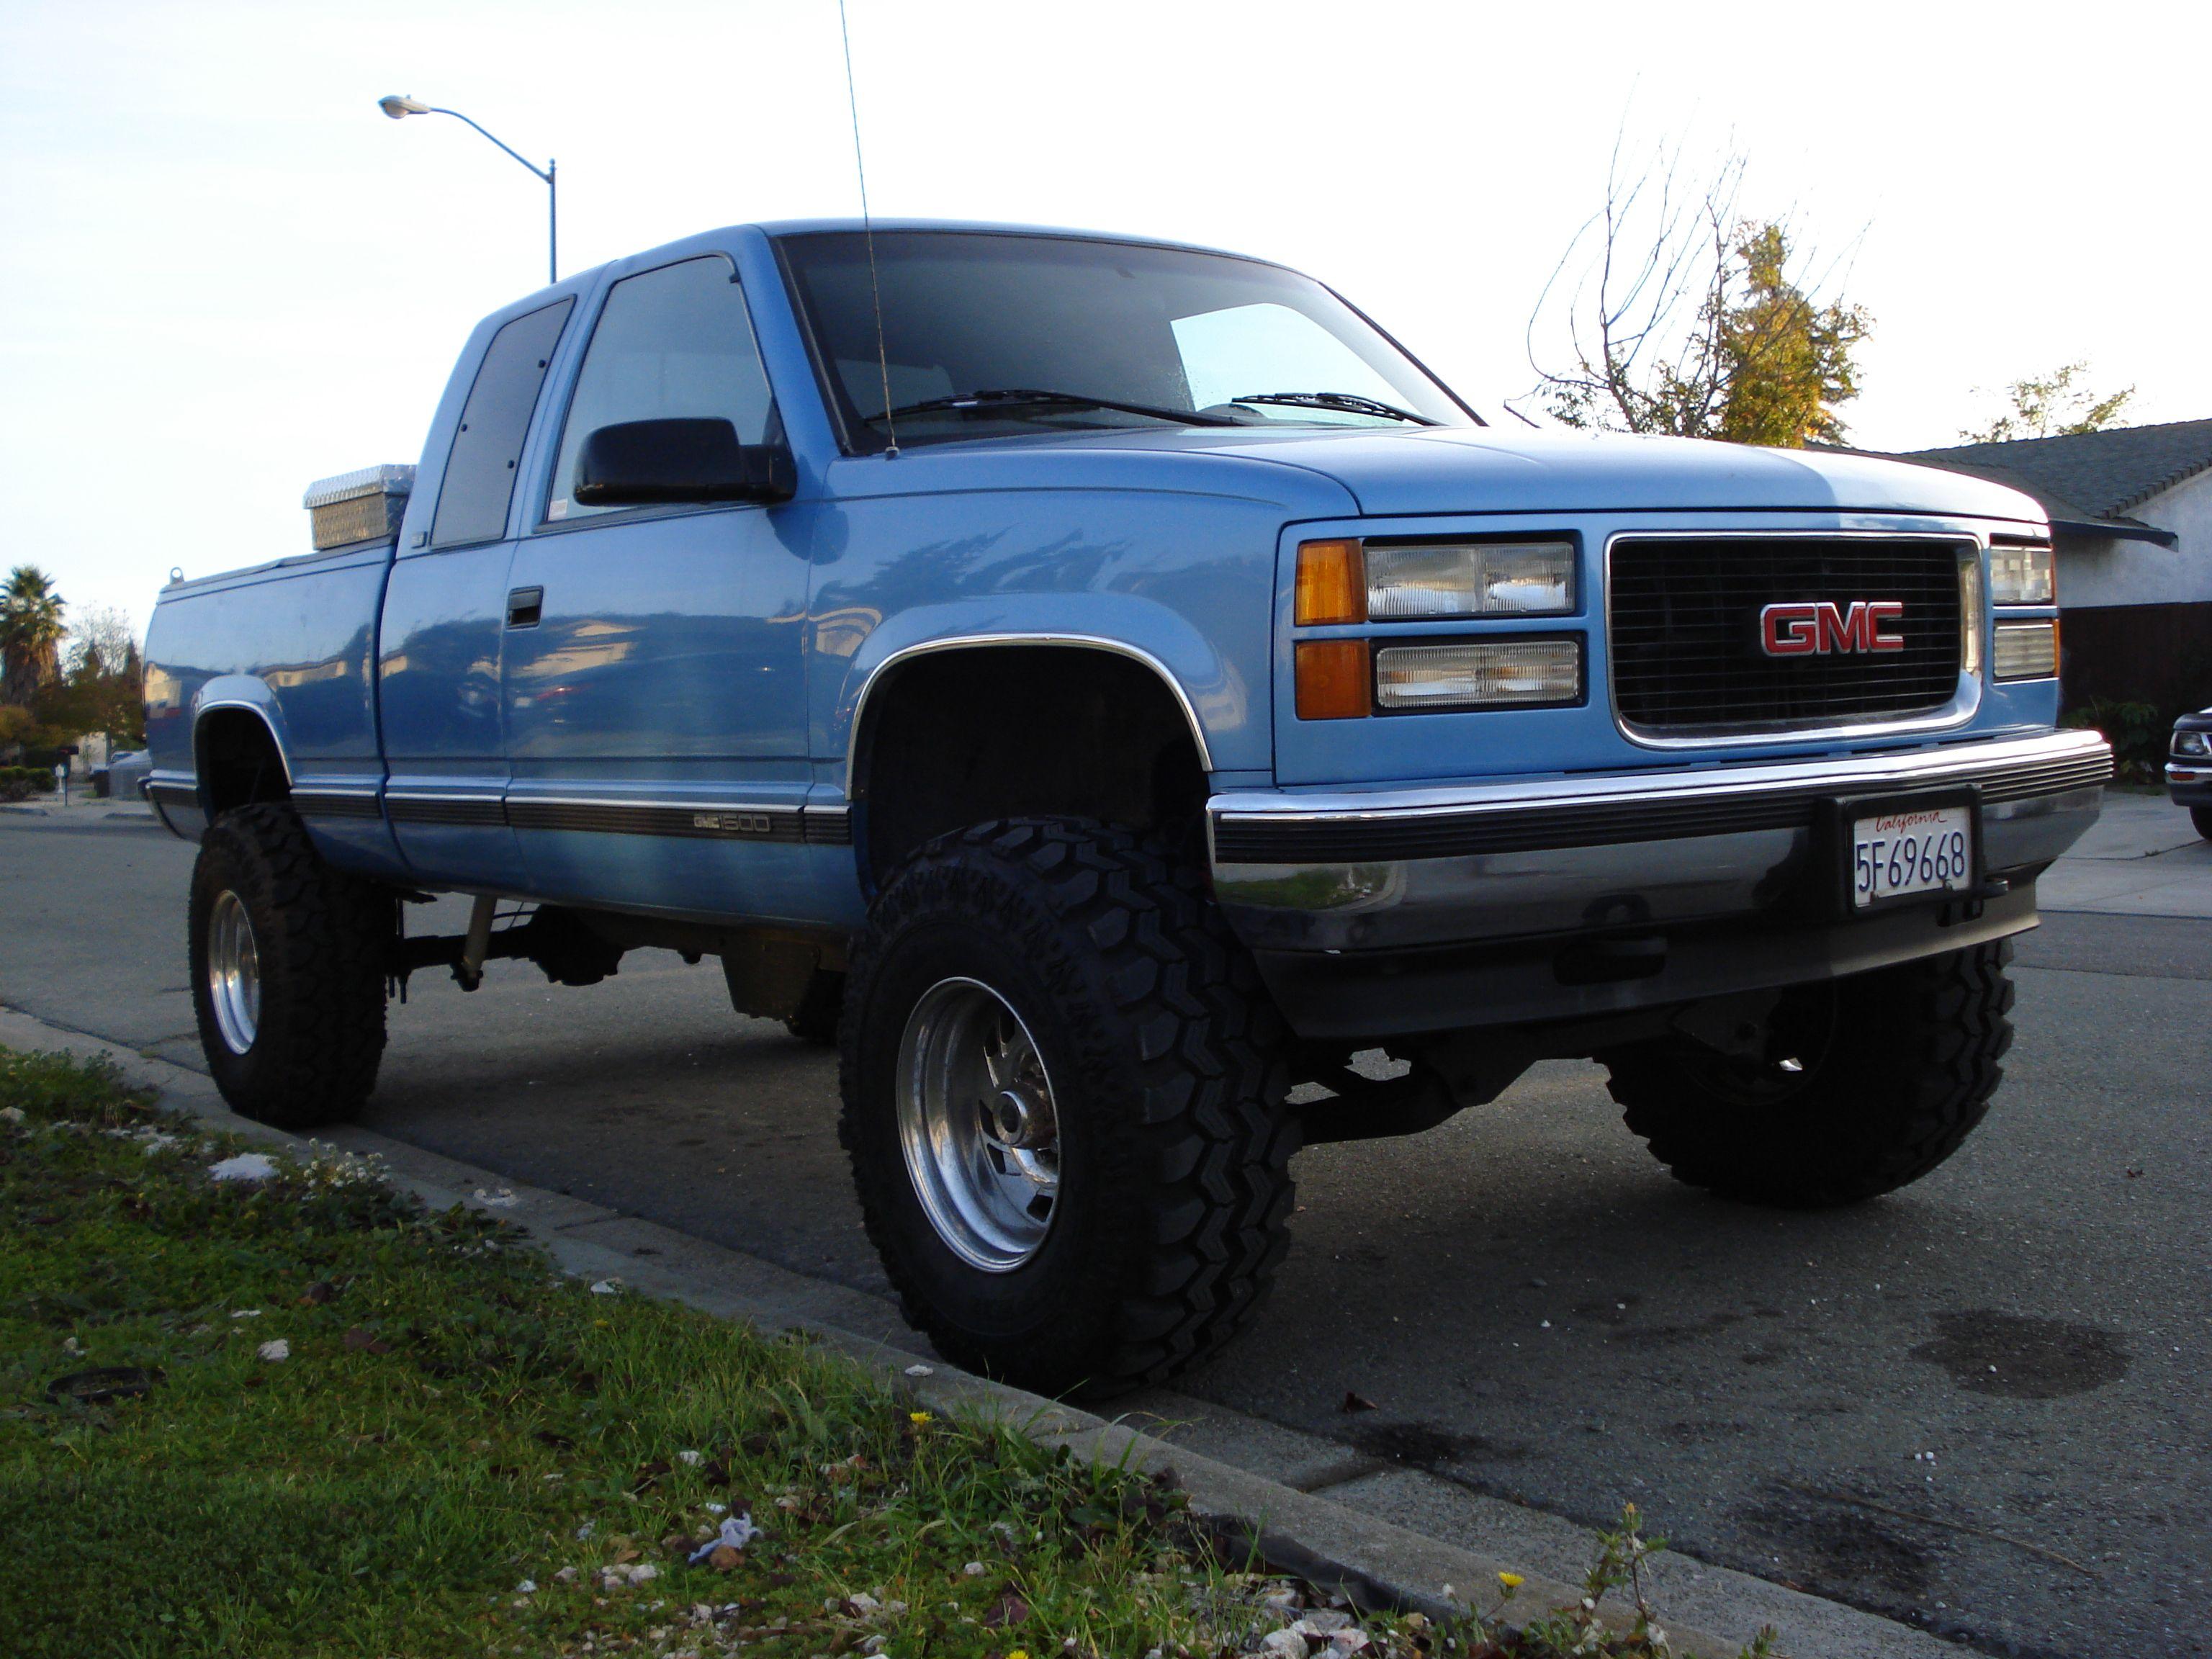 Lifted gmc sierra truck front hood view